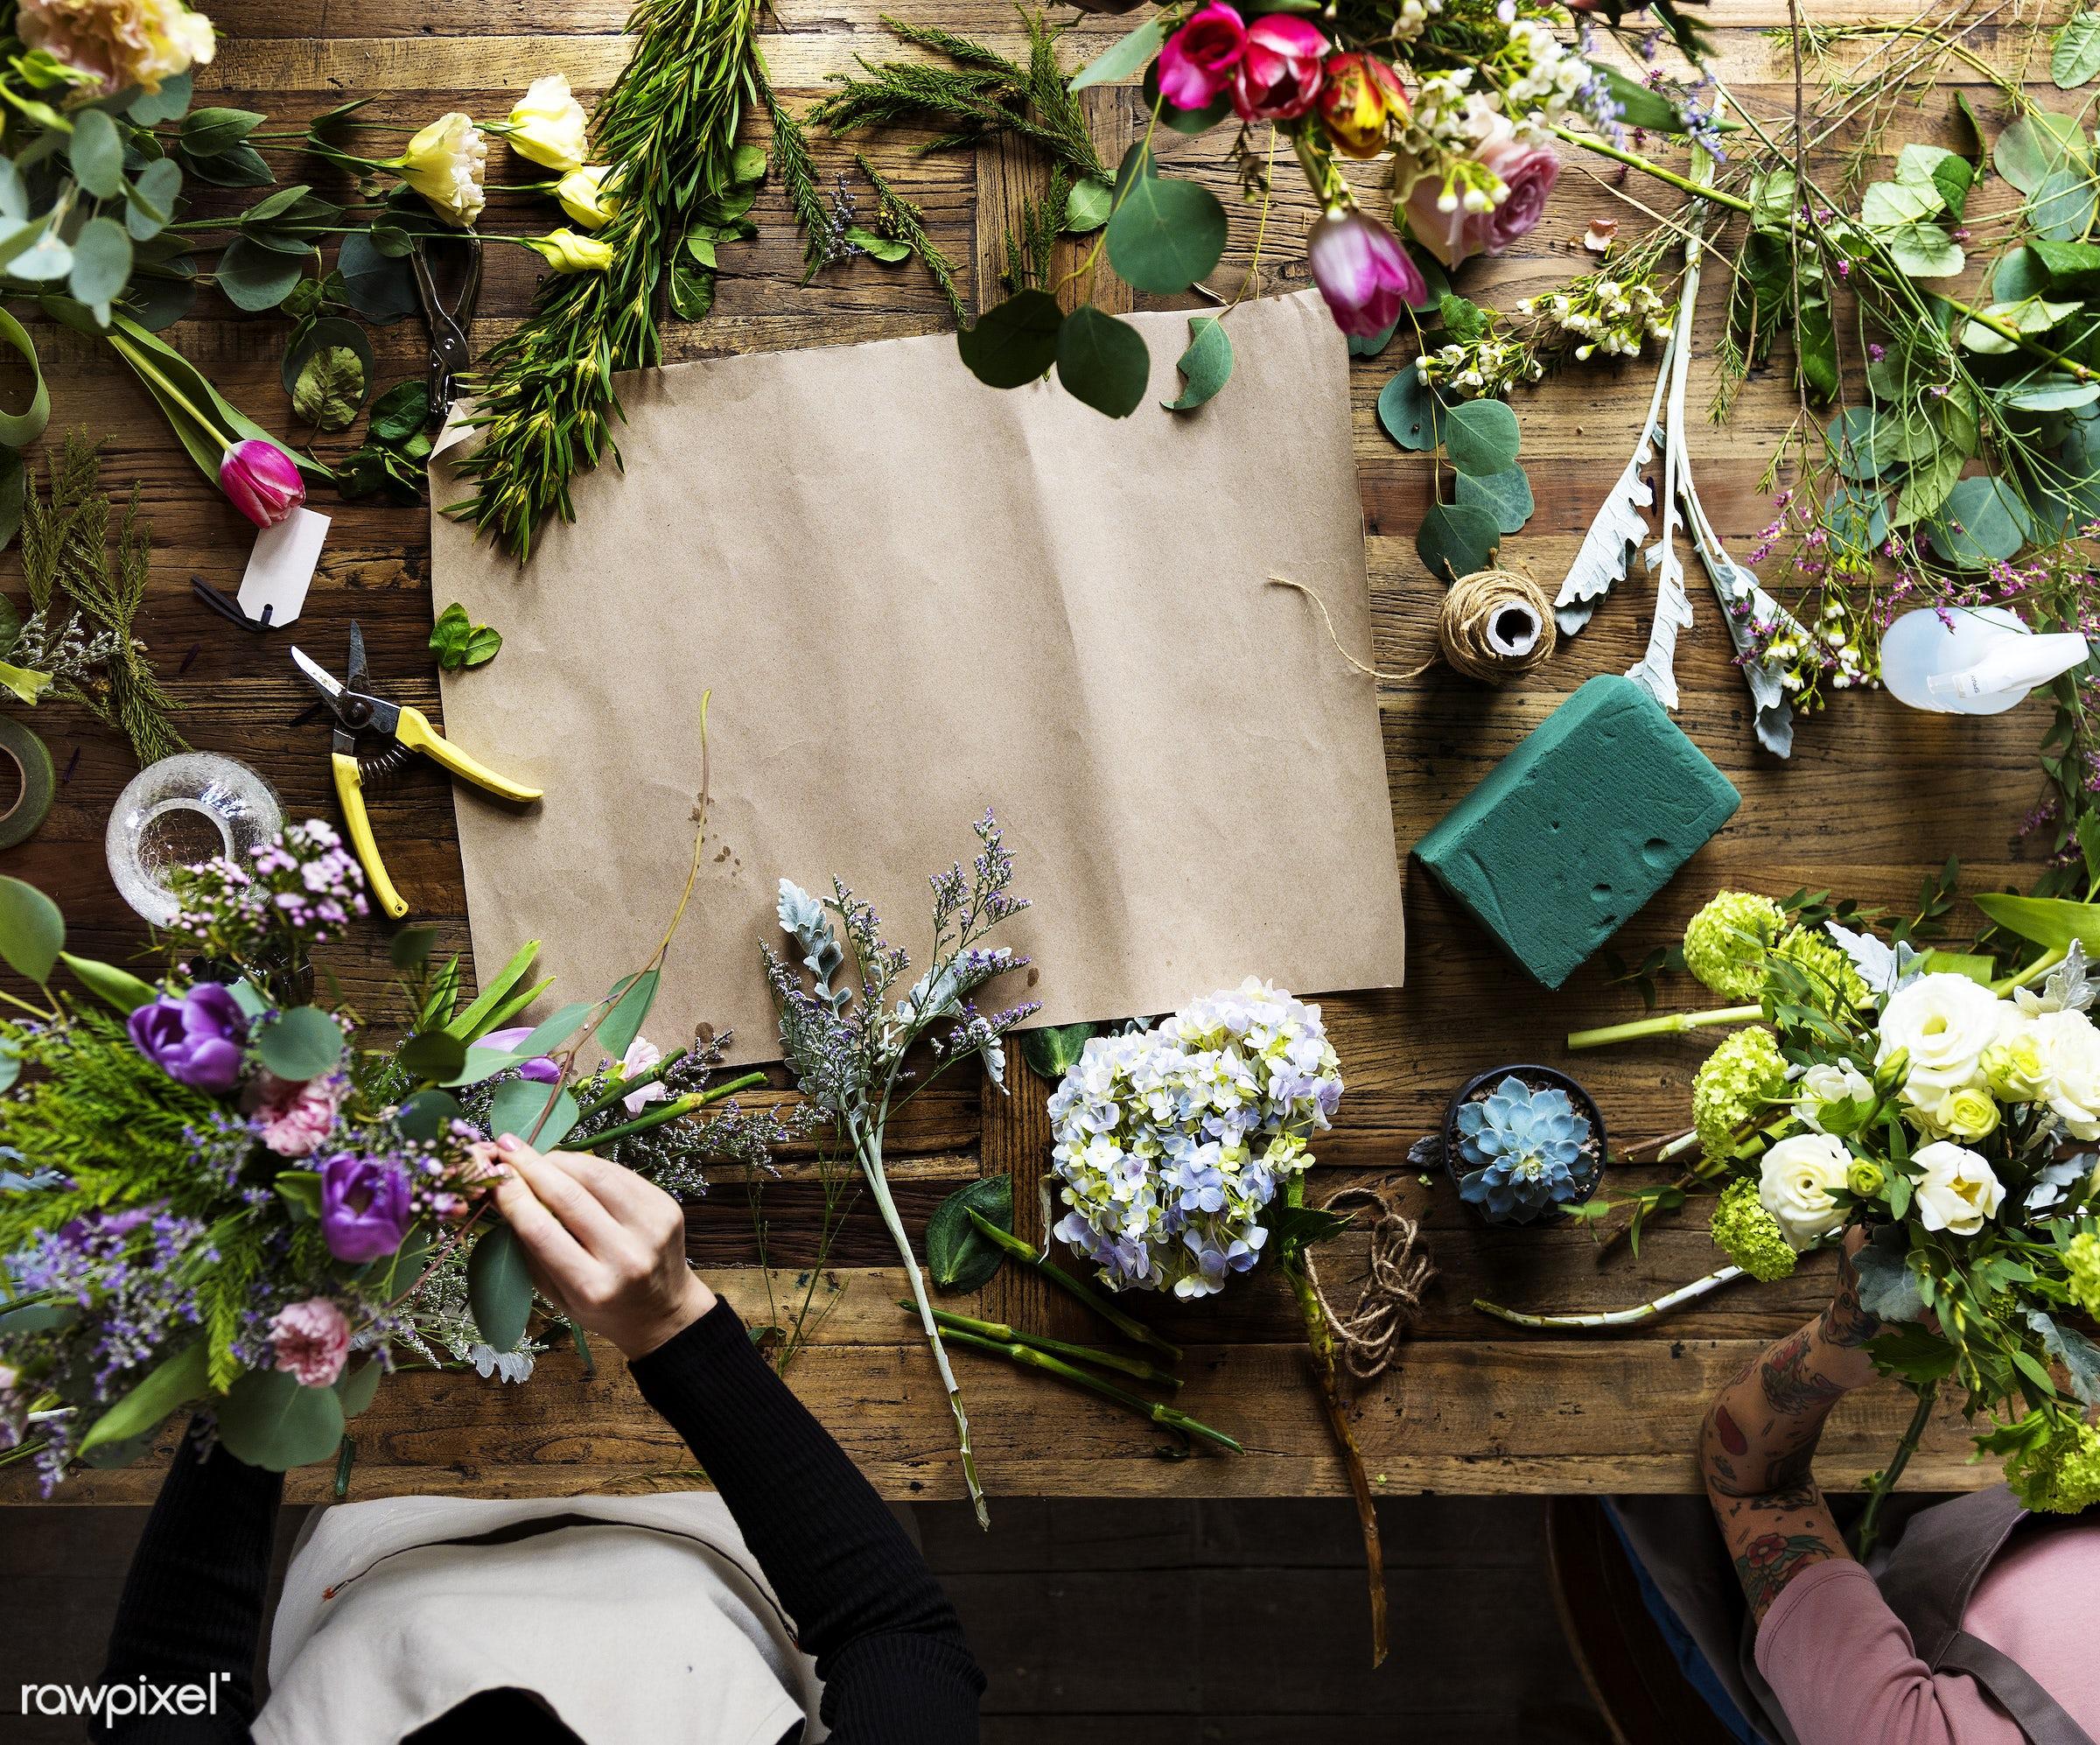 Florist job flower arrangement and decoration - workshop, art, skill, bouquet, hobby, aerial view, table, arrangement,...